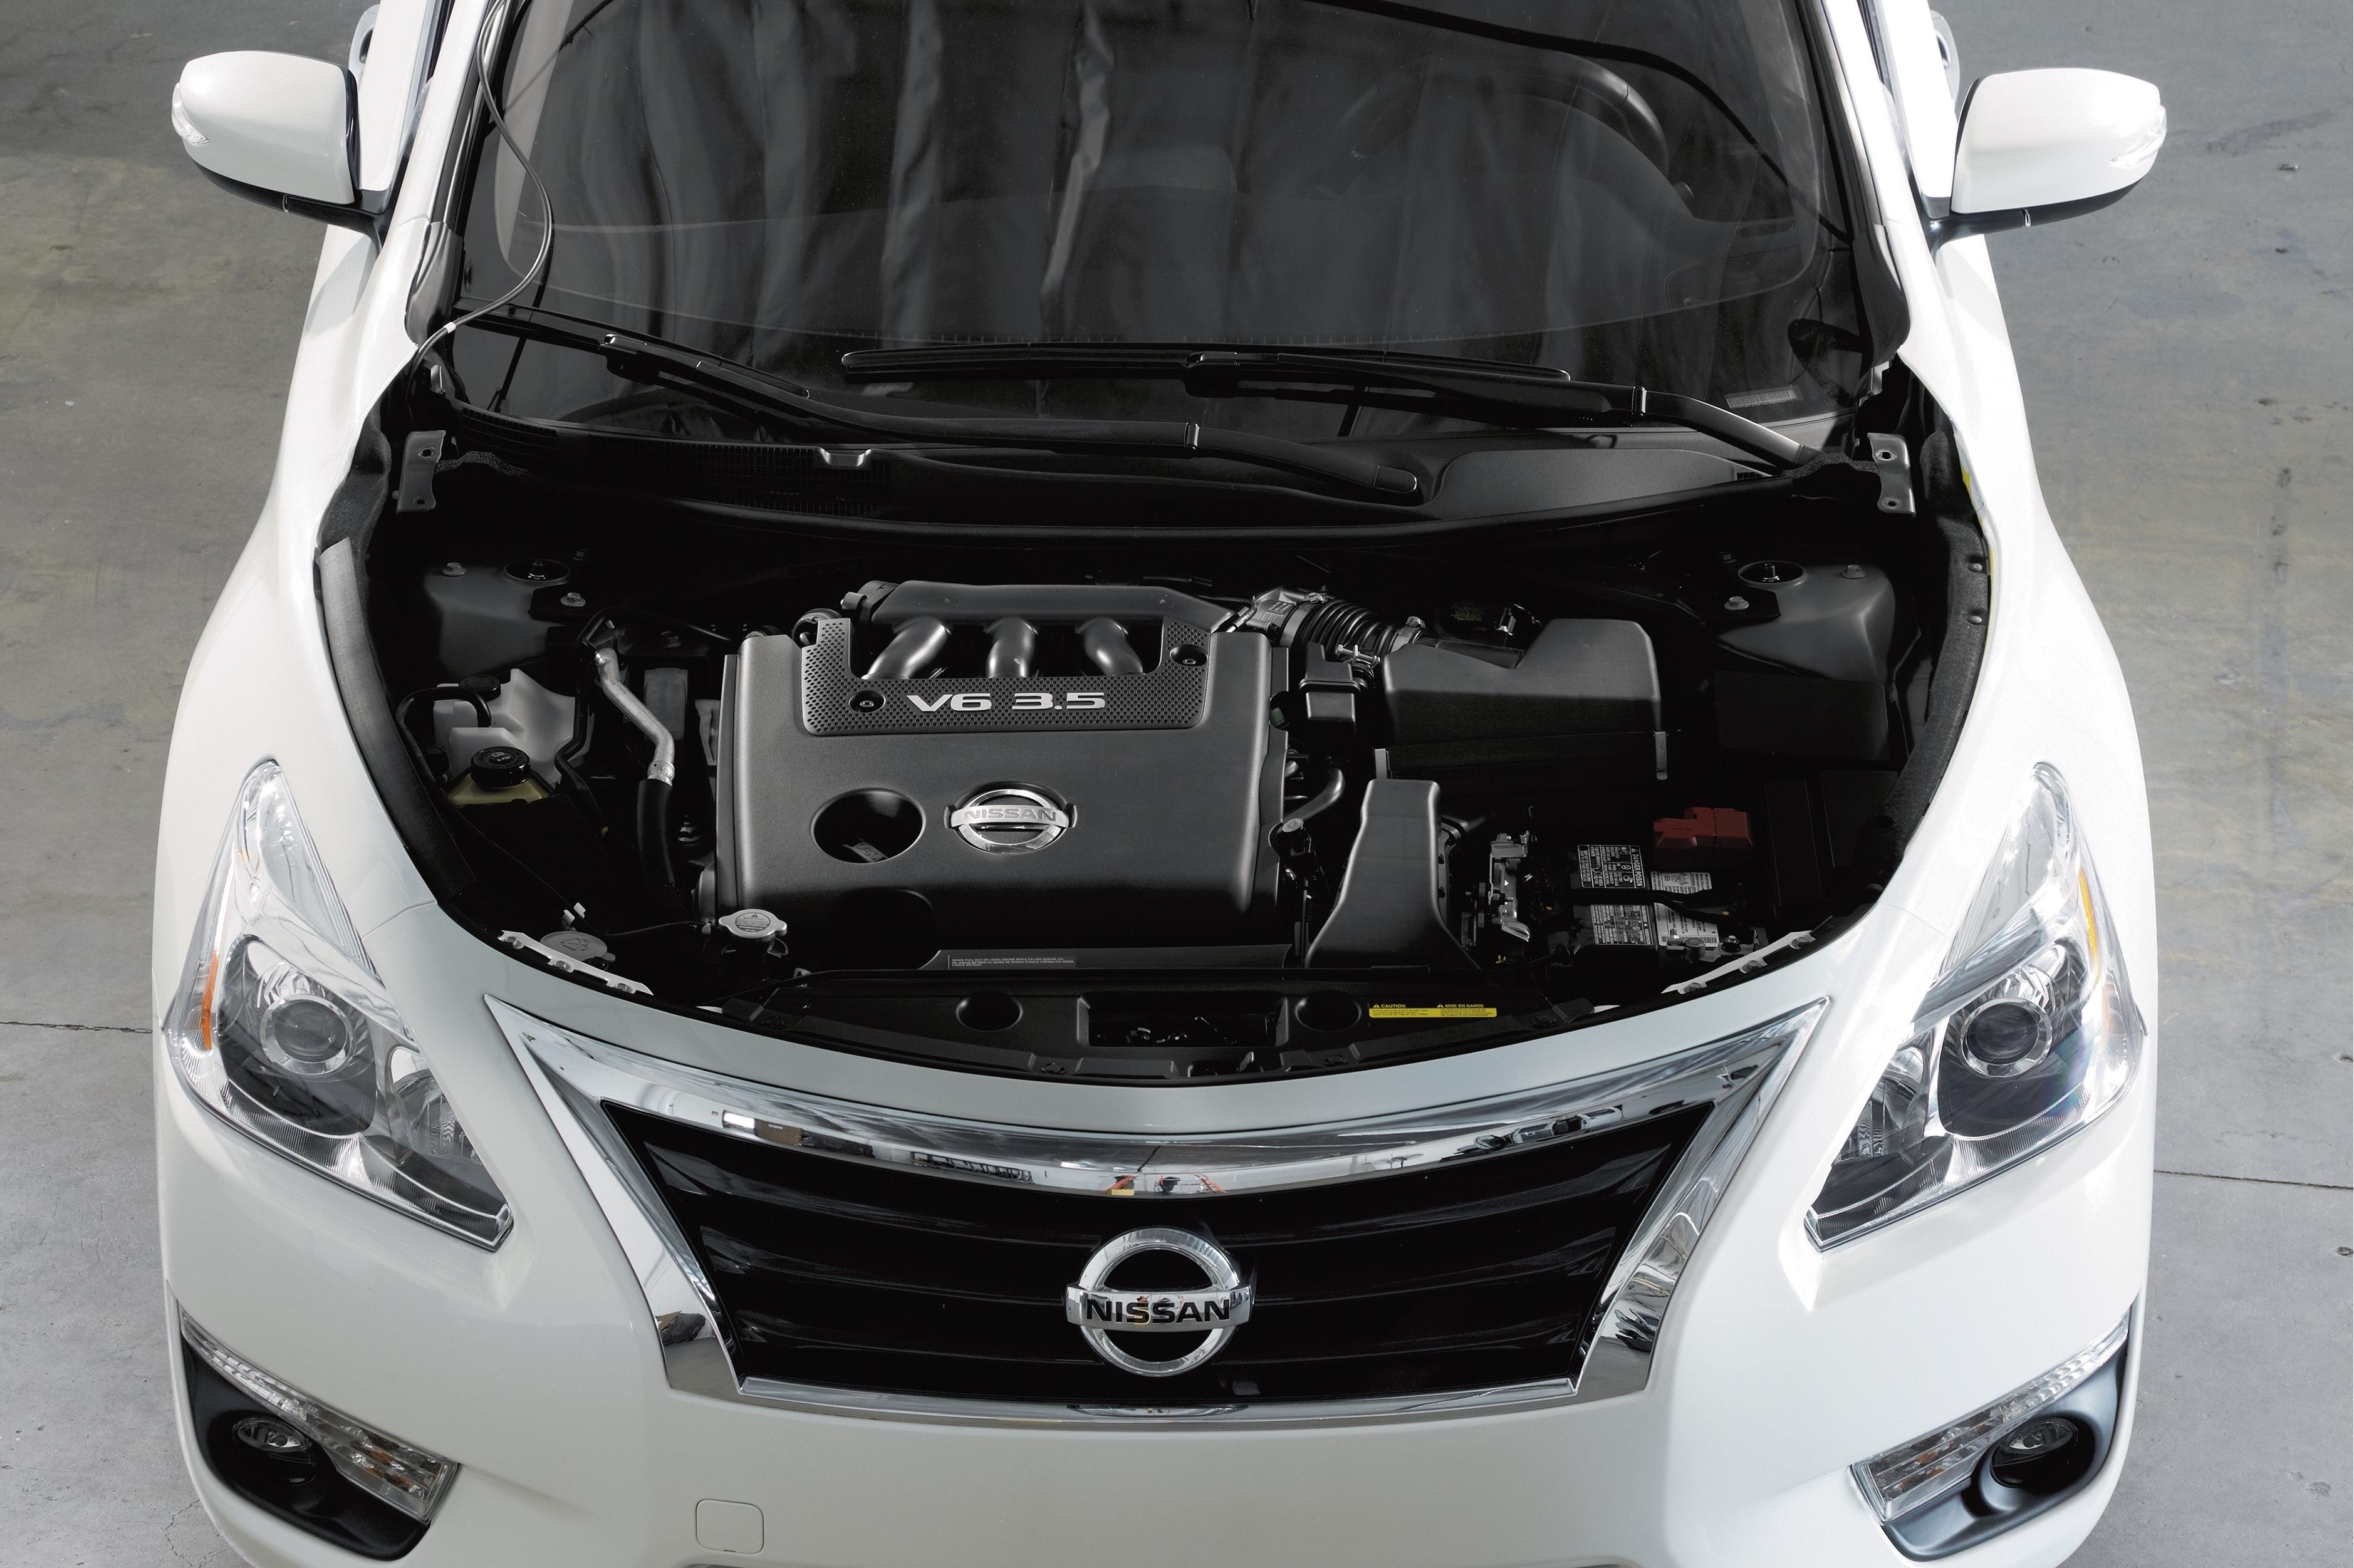 Nissan Altima Fontana